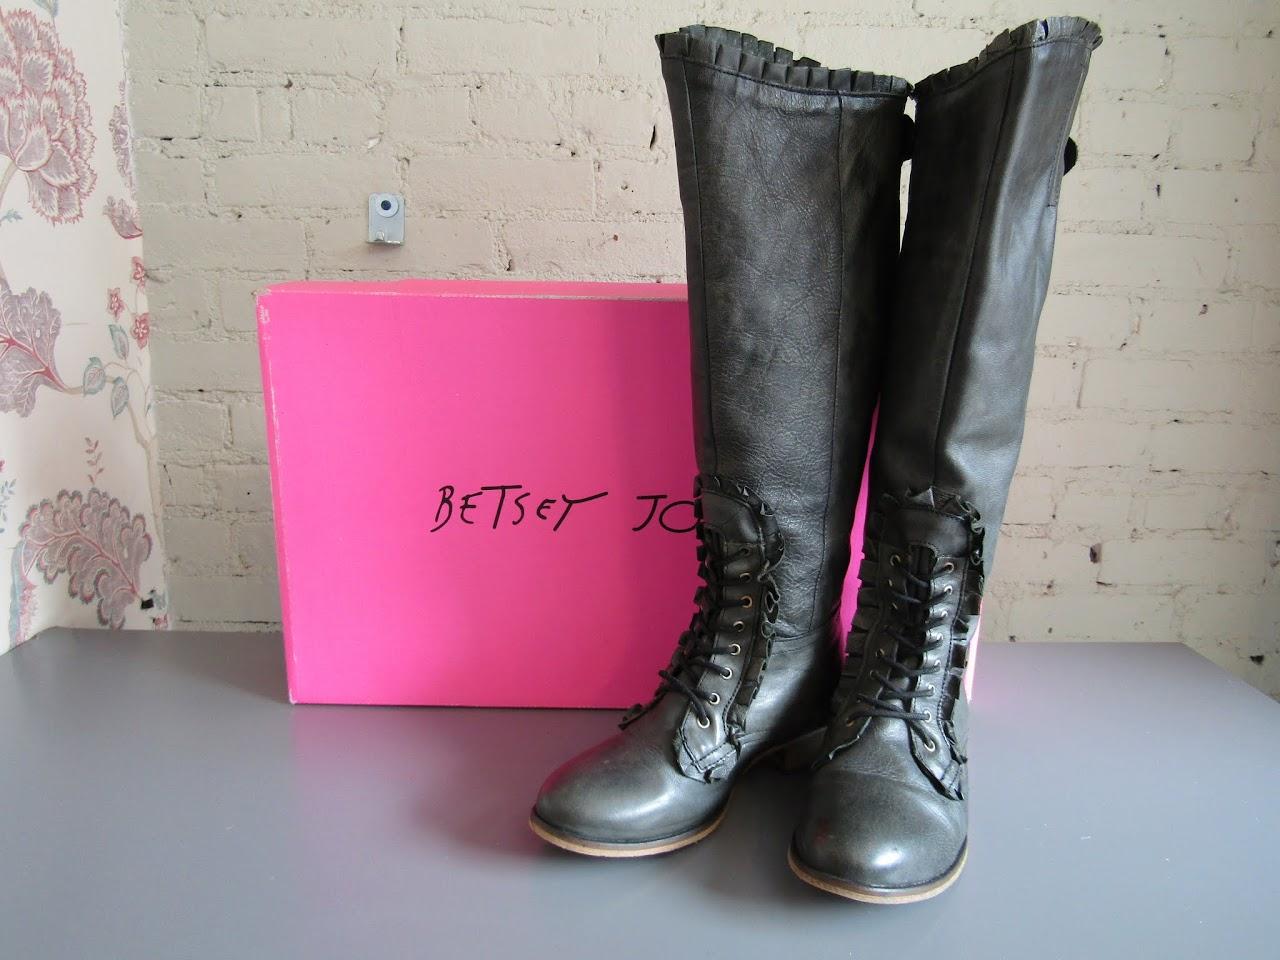 Betsey Johnson 'Rally' Calf Boot